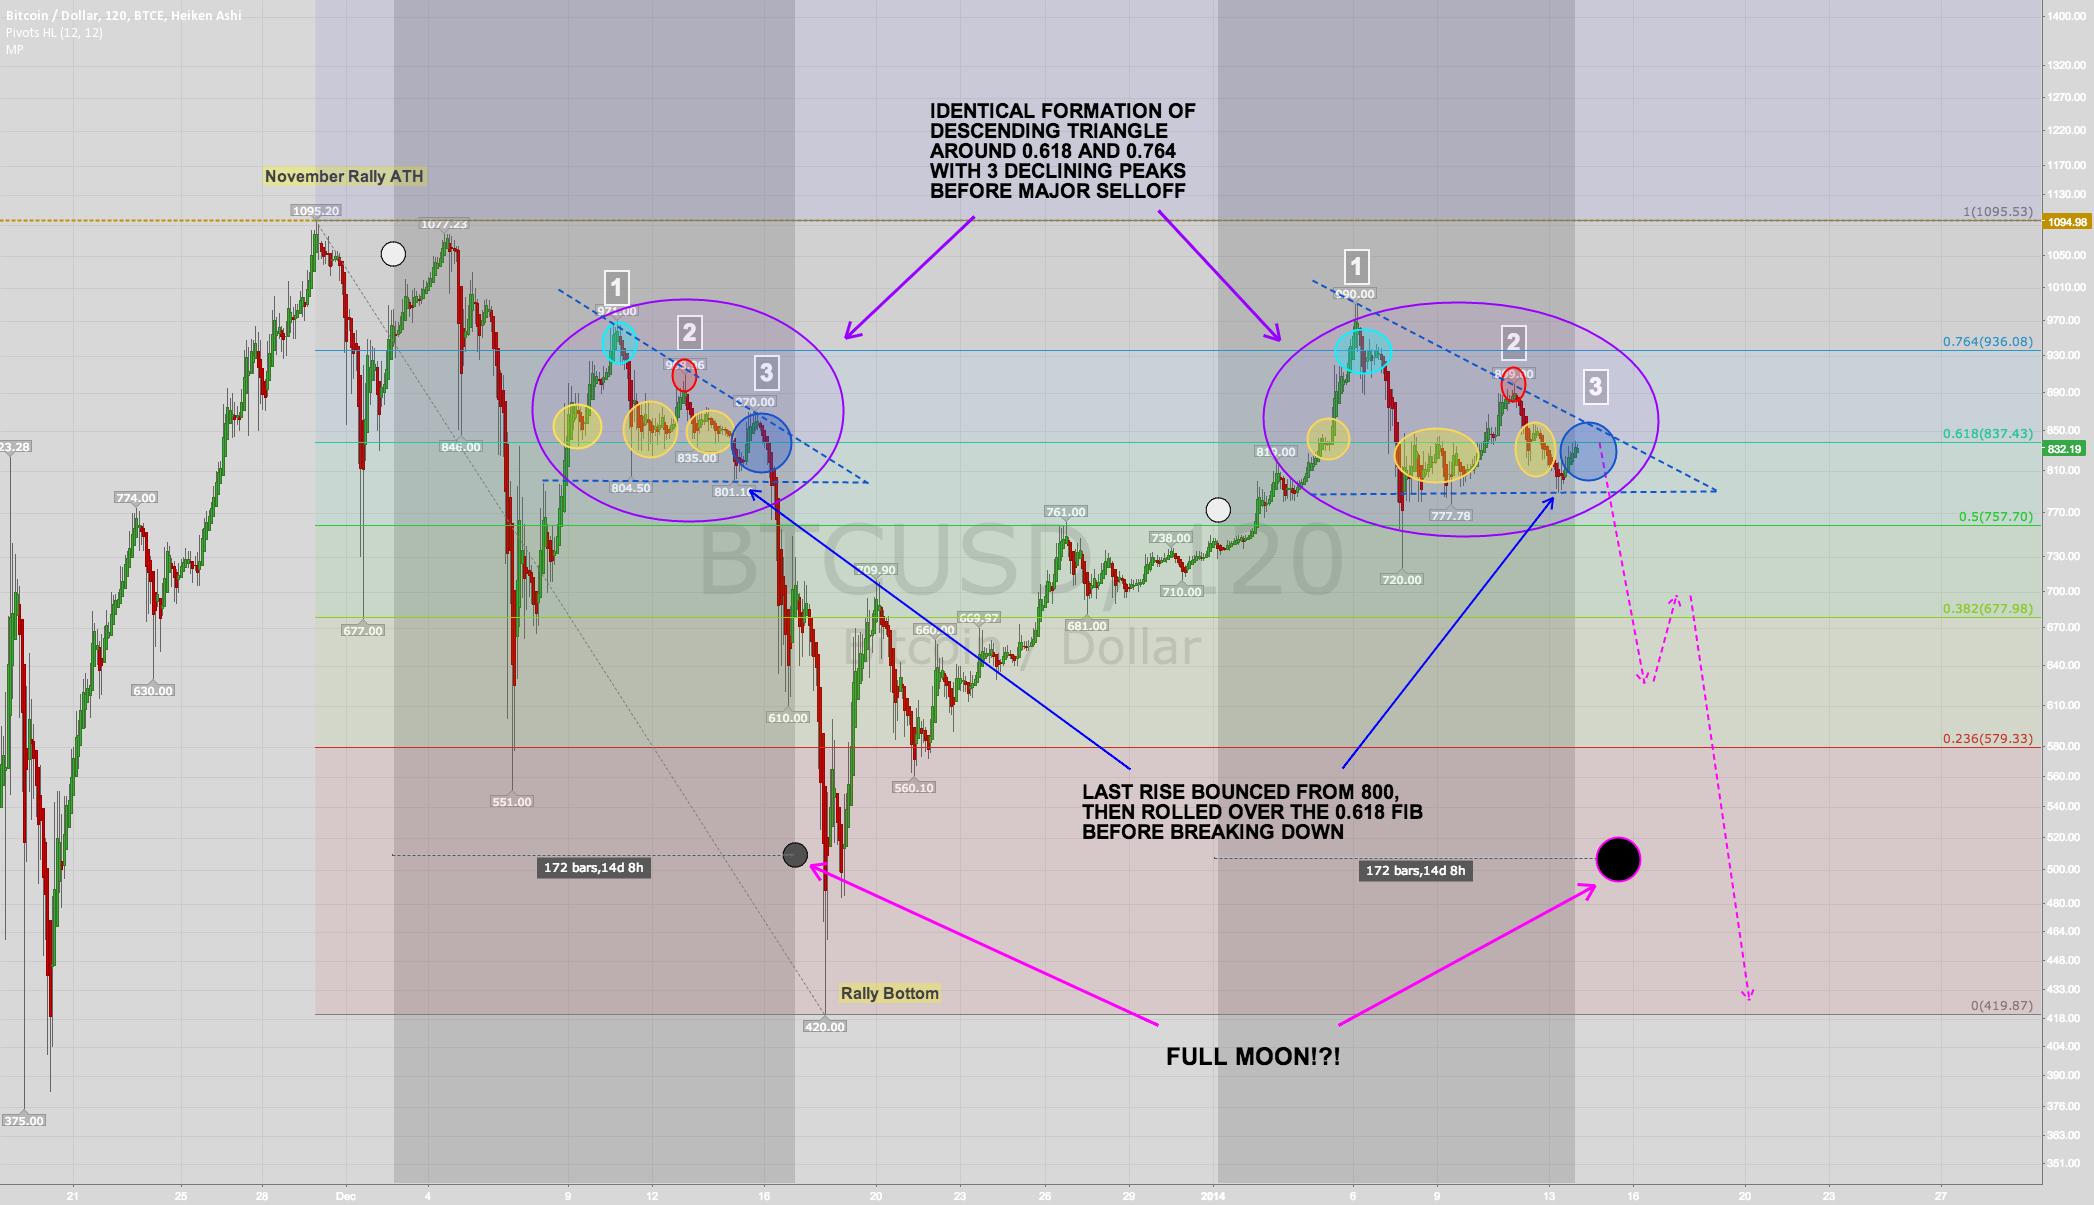 Current descending triangle pattern shockingly similar +moons!